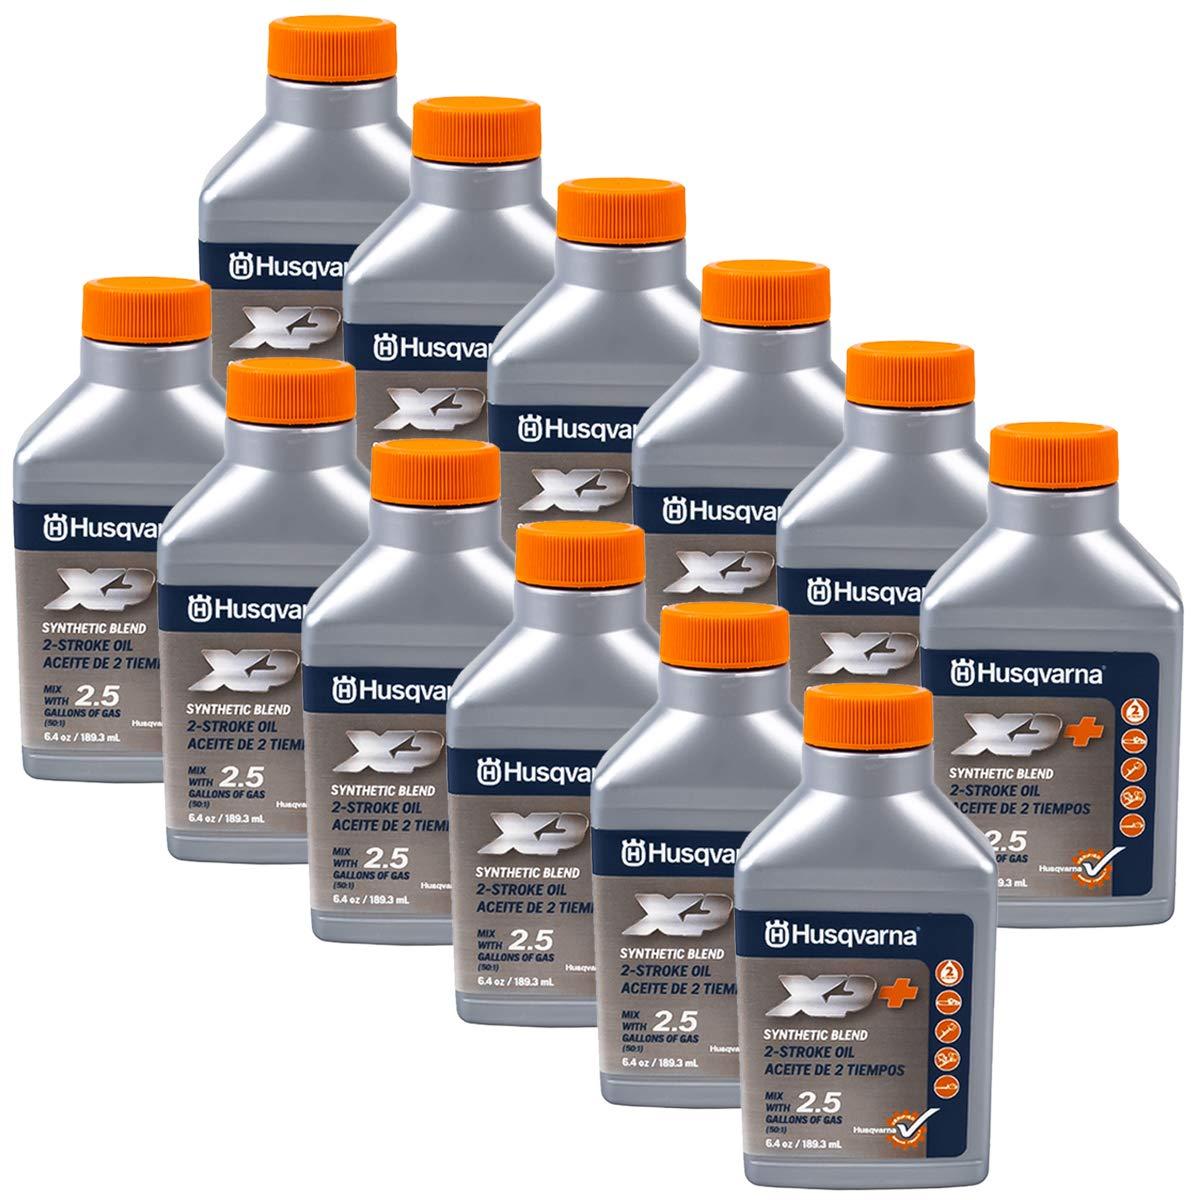 Husqvarna 12PK Genuine OEM XP 2-Cycle Oil 2.5 Gallon Mix 6.4oz 593152303 by Husqvarna